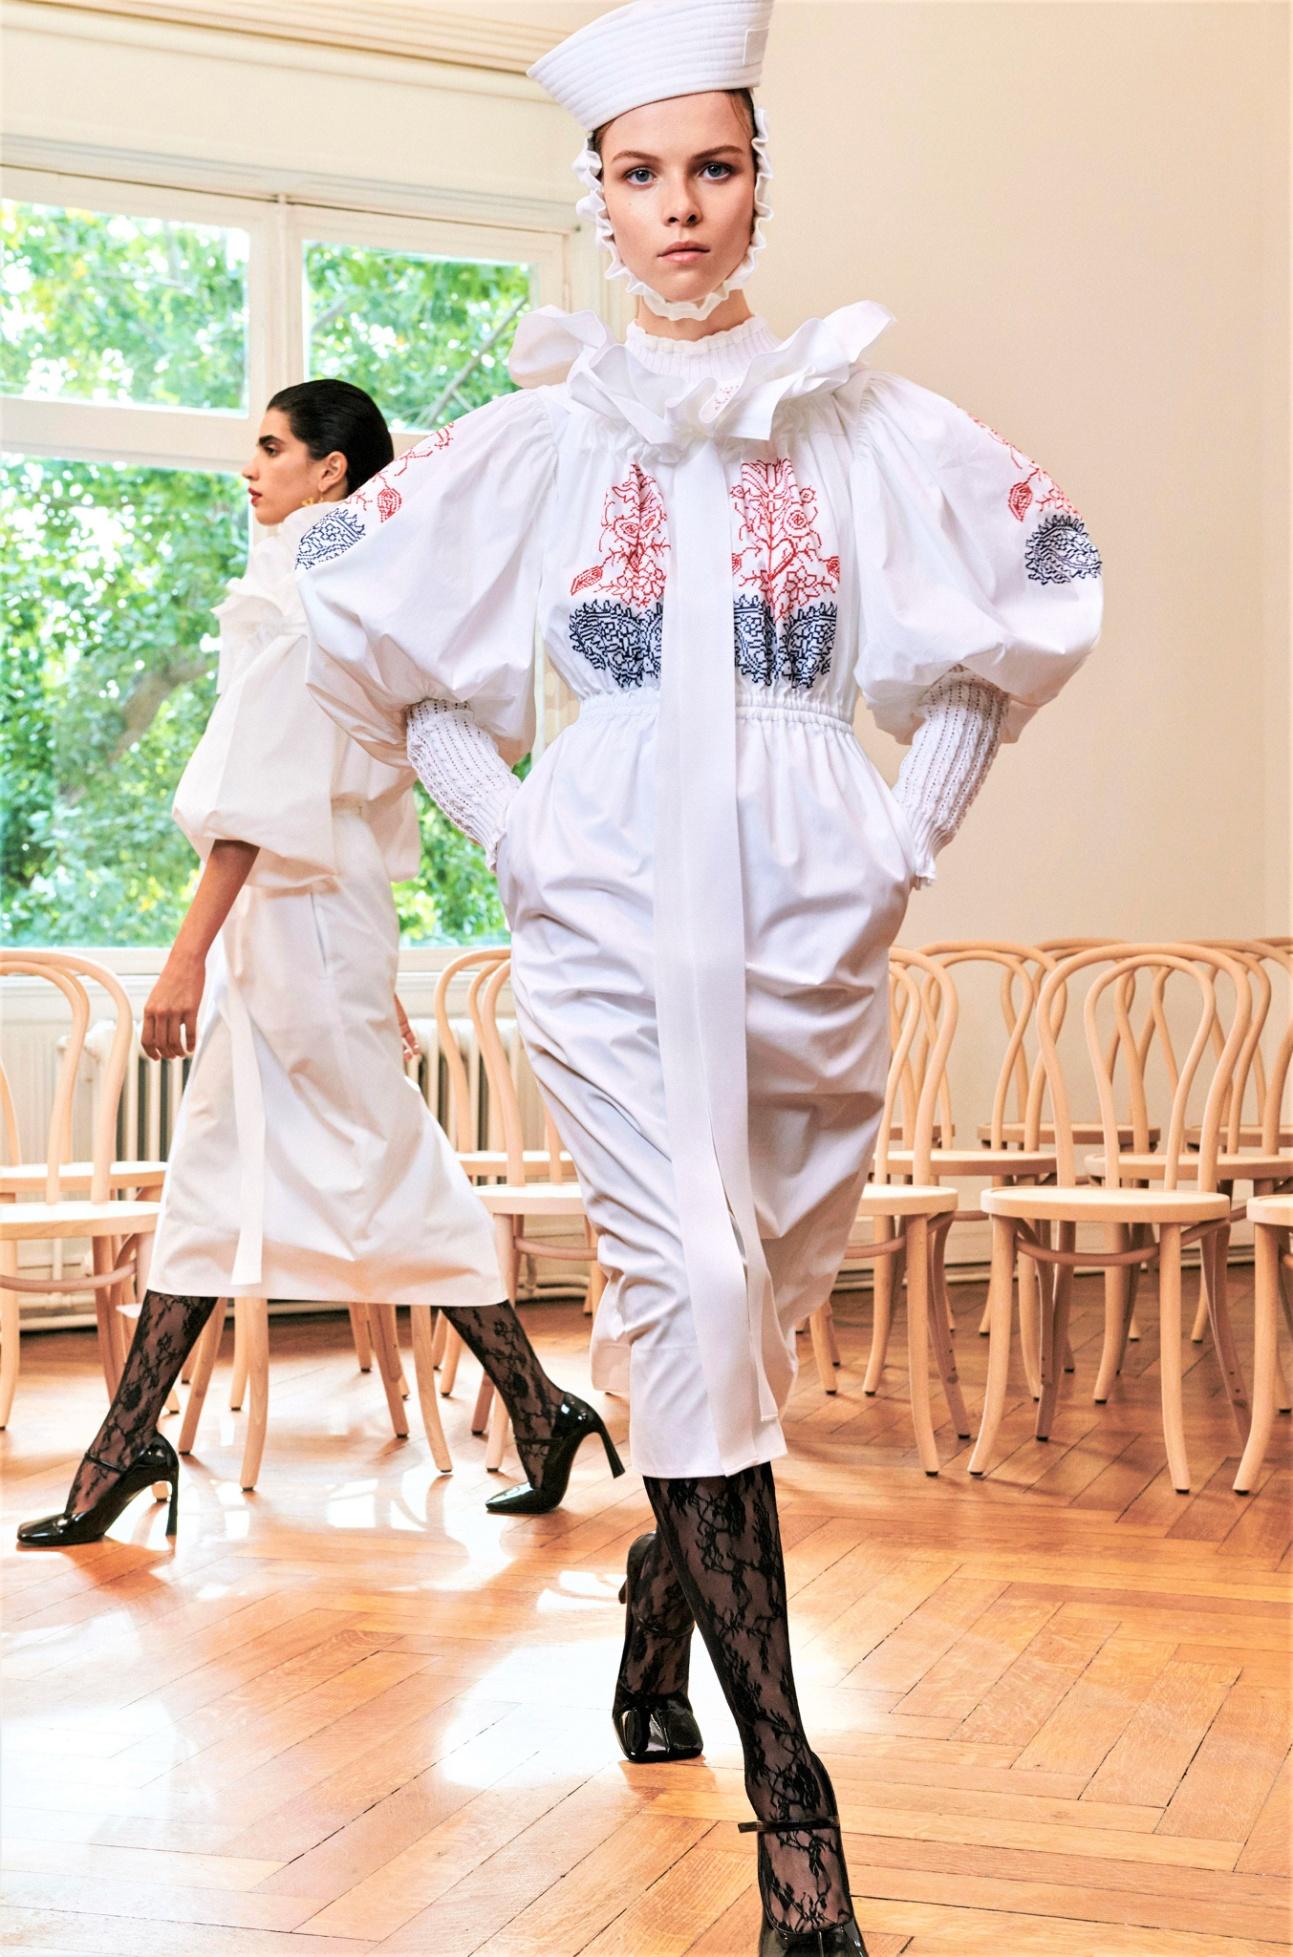 00003-Patou-RTW-Spring-2021-wht embroid dress Paris (2) cropped.jpg